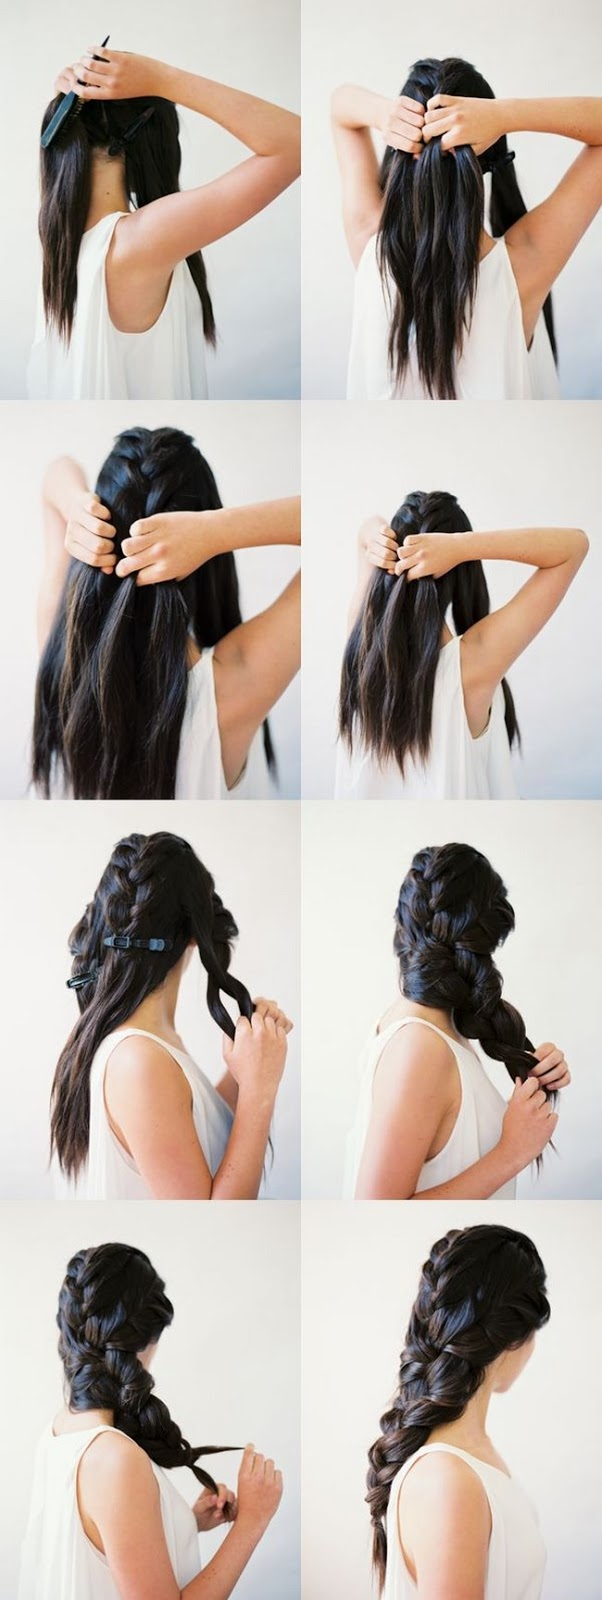 peinados para cabello largo paso a paso - Peinados Largos